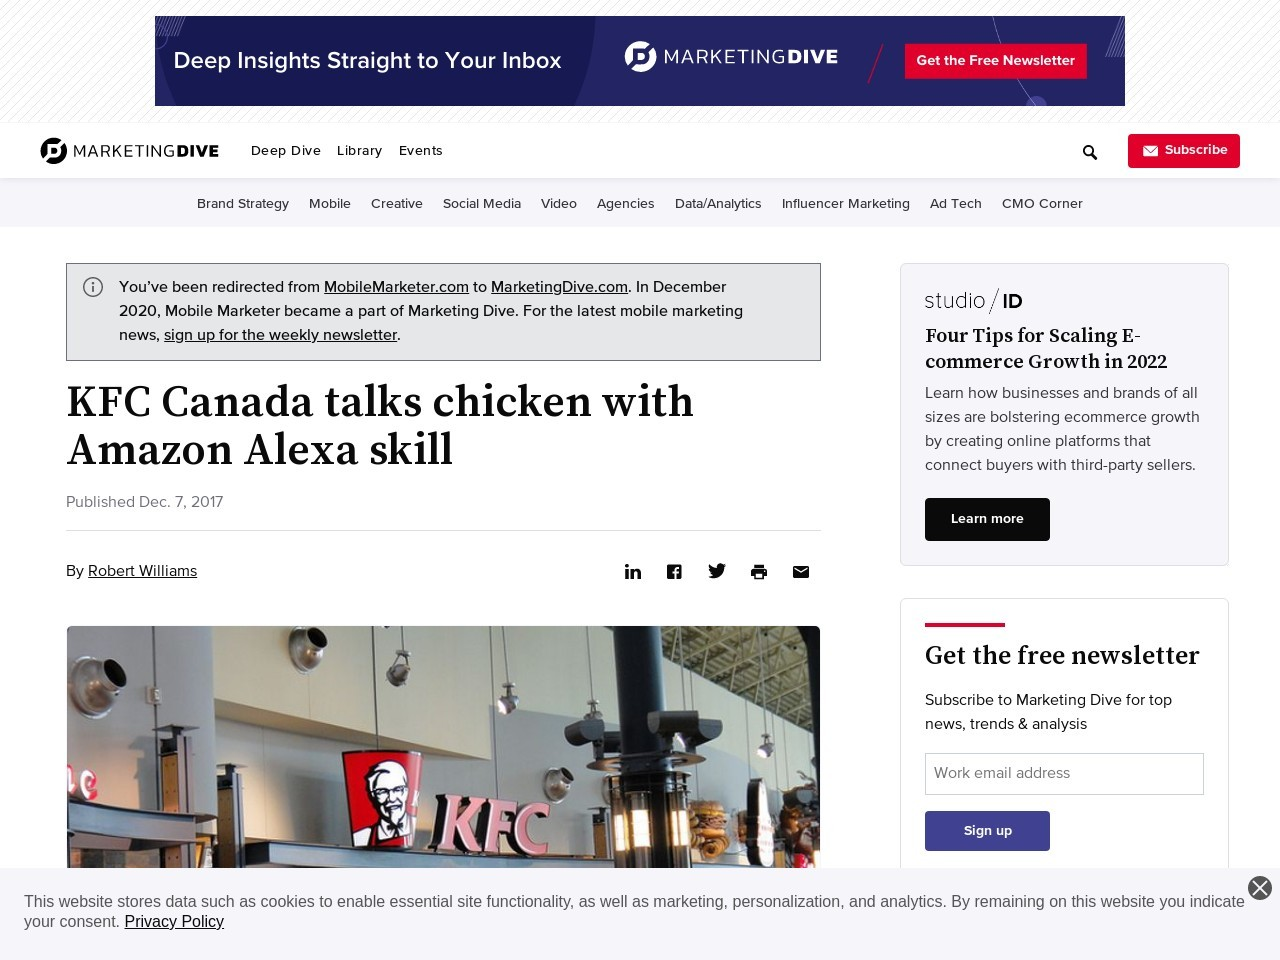 KFC Canada talks chicken with Amazon Alexa skill